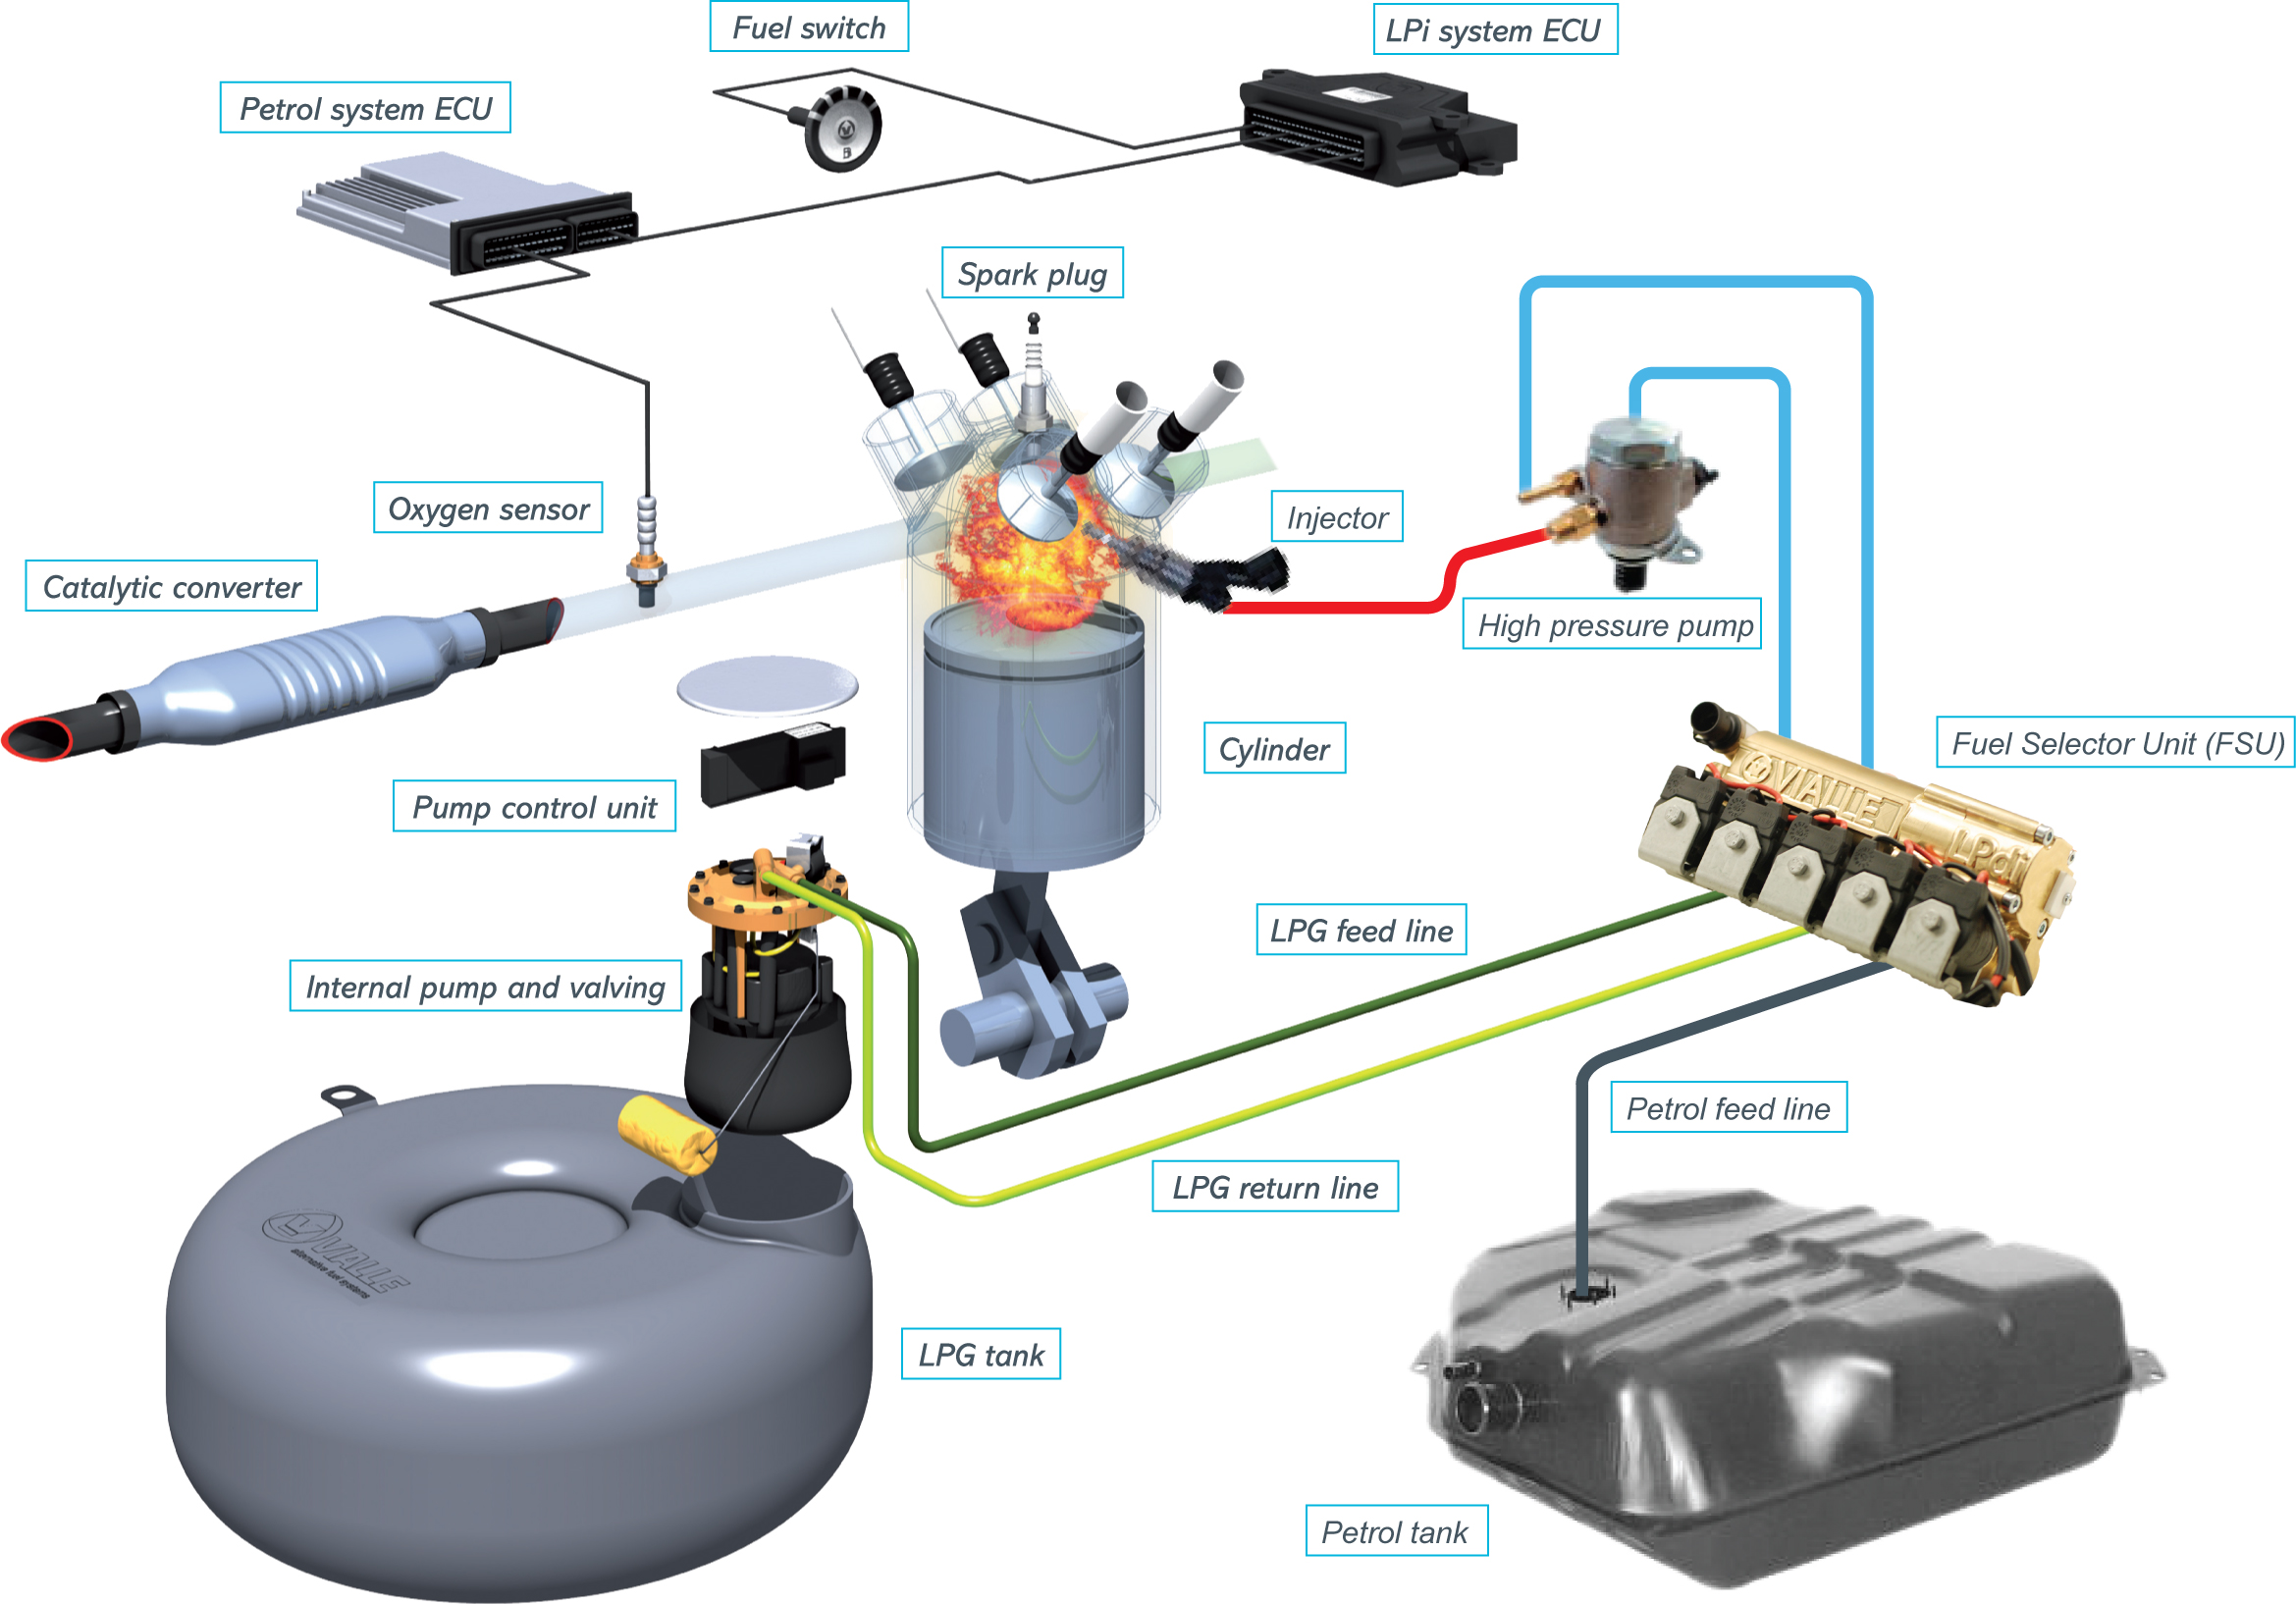 lpdischeme lpg wiring diagram efcaviation com lpg petrol switch wiring diagram at gsmportal.co